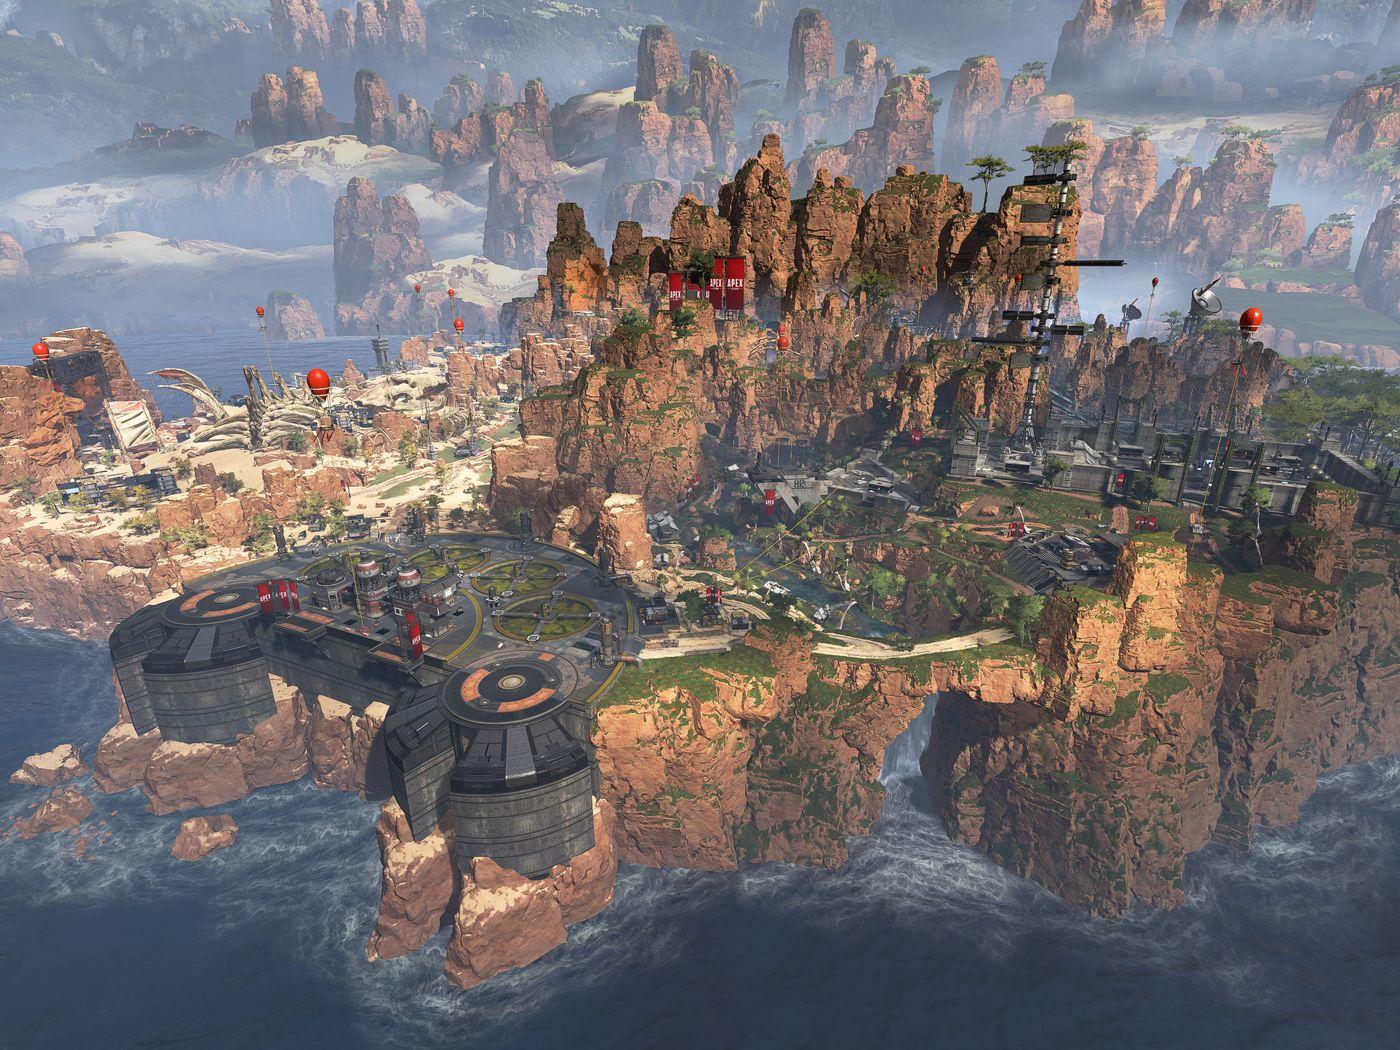 Apex Legends: Hands-on impressions of Titanfall battle